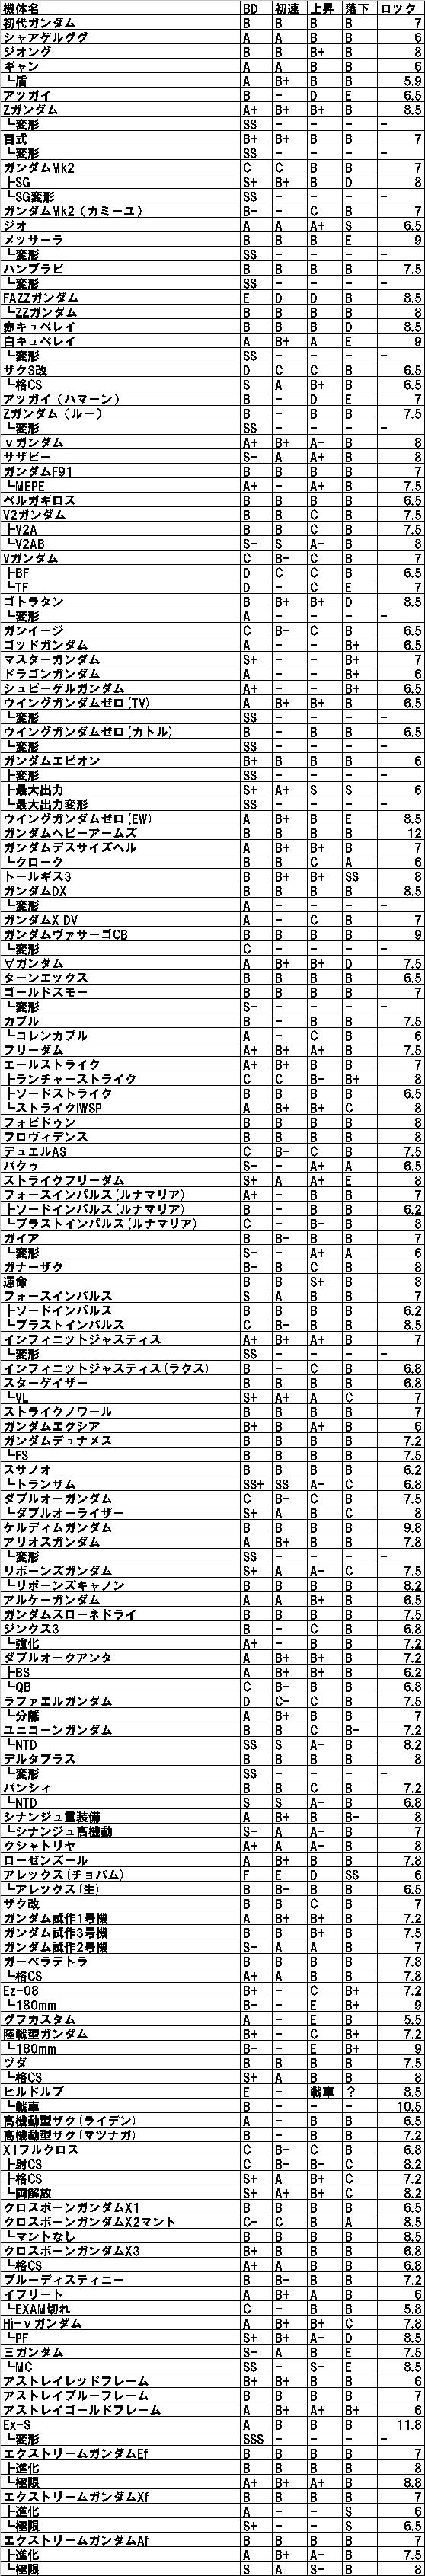 140603-02